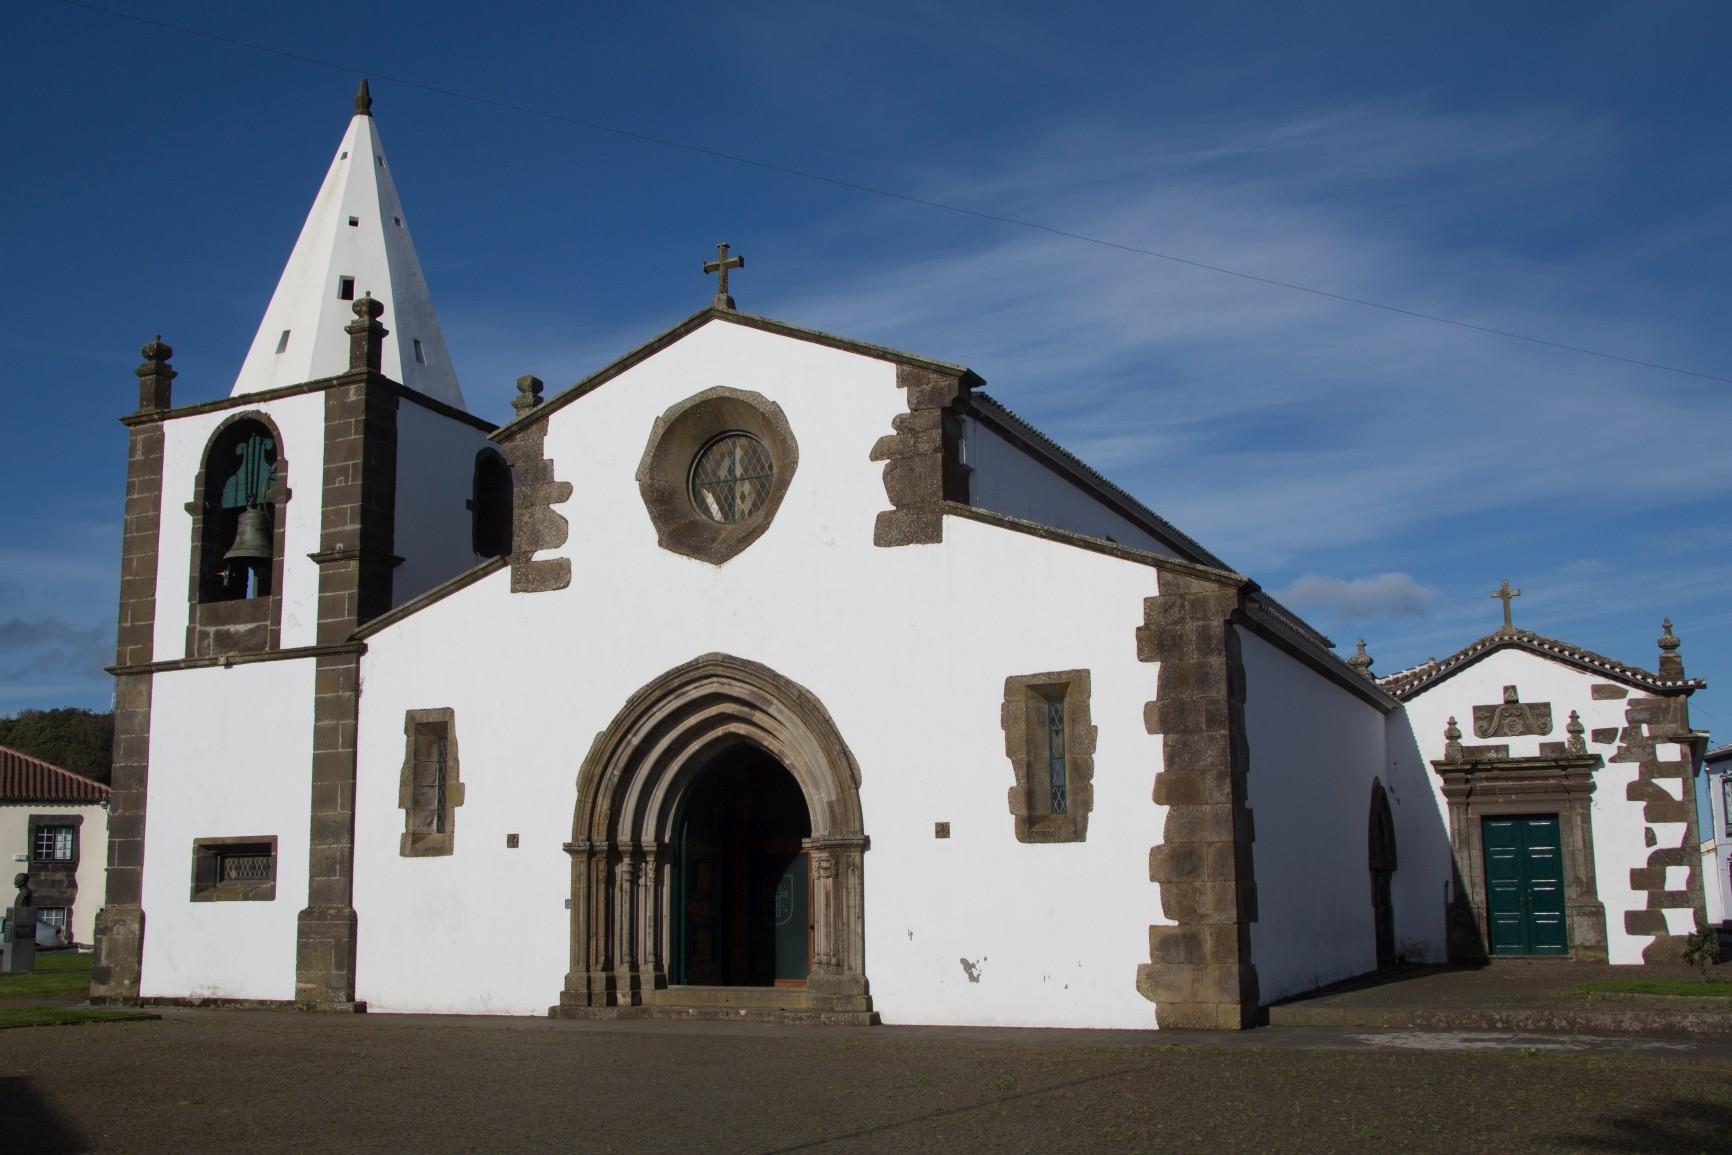 Terceira - Sao Sebastiao - Kirche Igreja Matriz de Sao Sebastiao